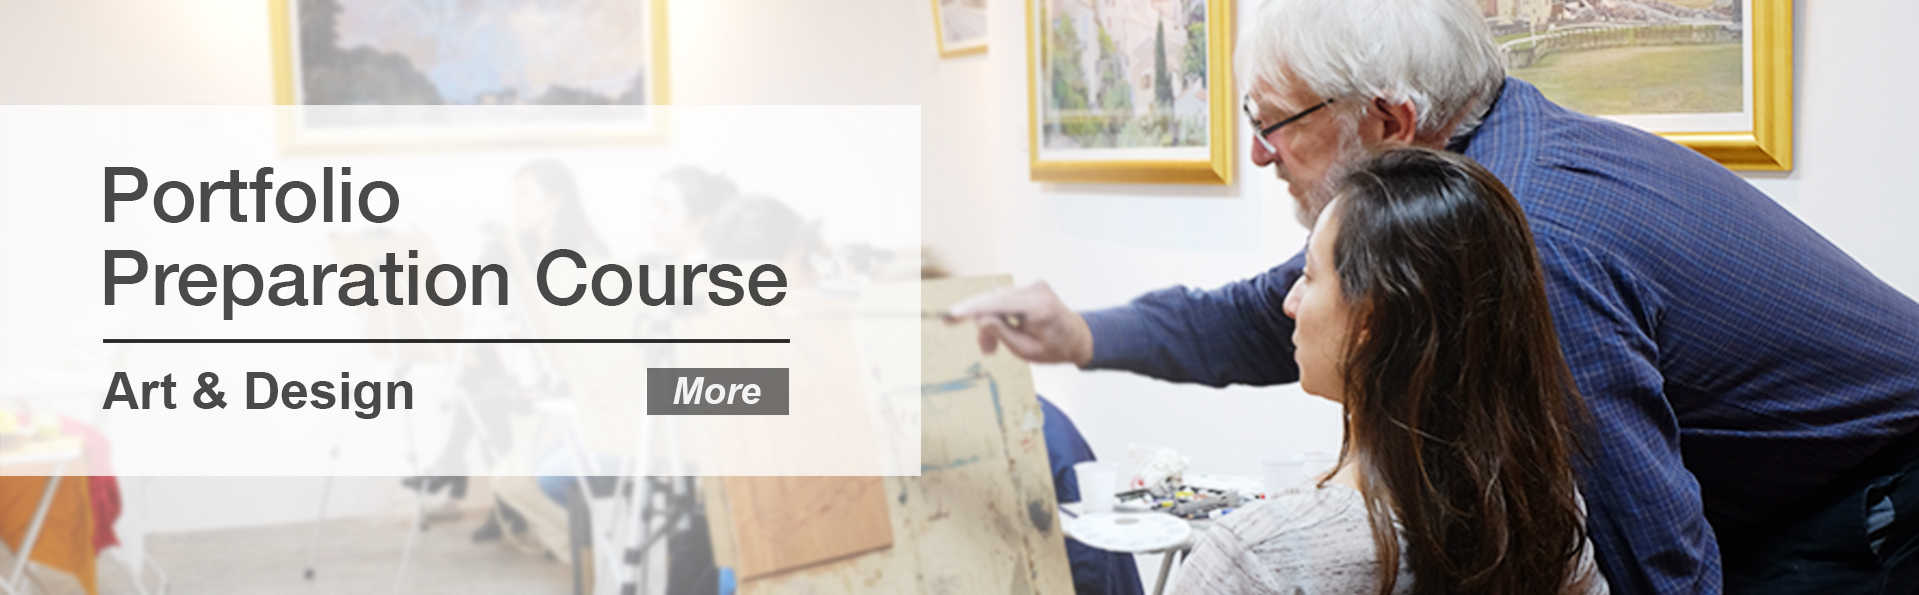 central-london-art-portfolio-preparation-course